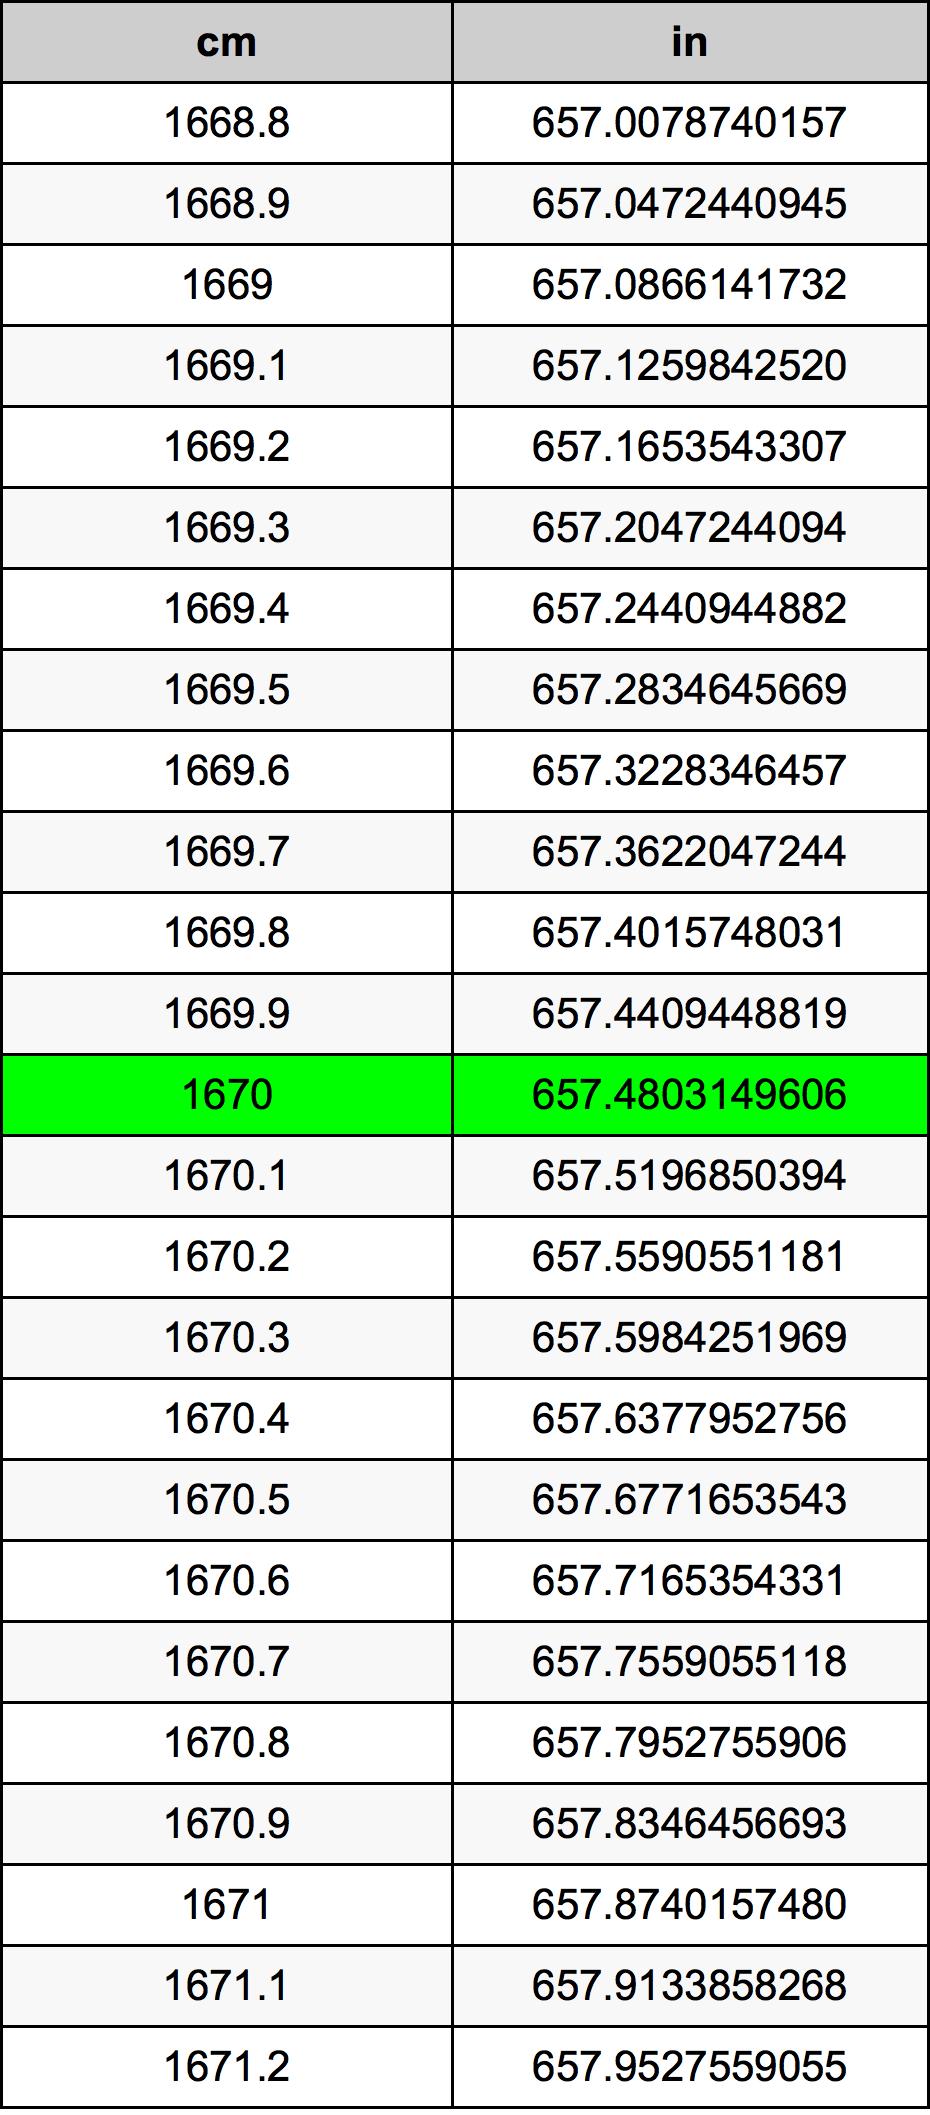 1670 Centimeter konverteringstabellen